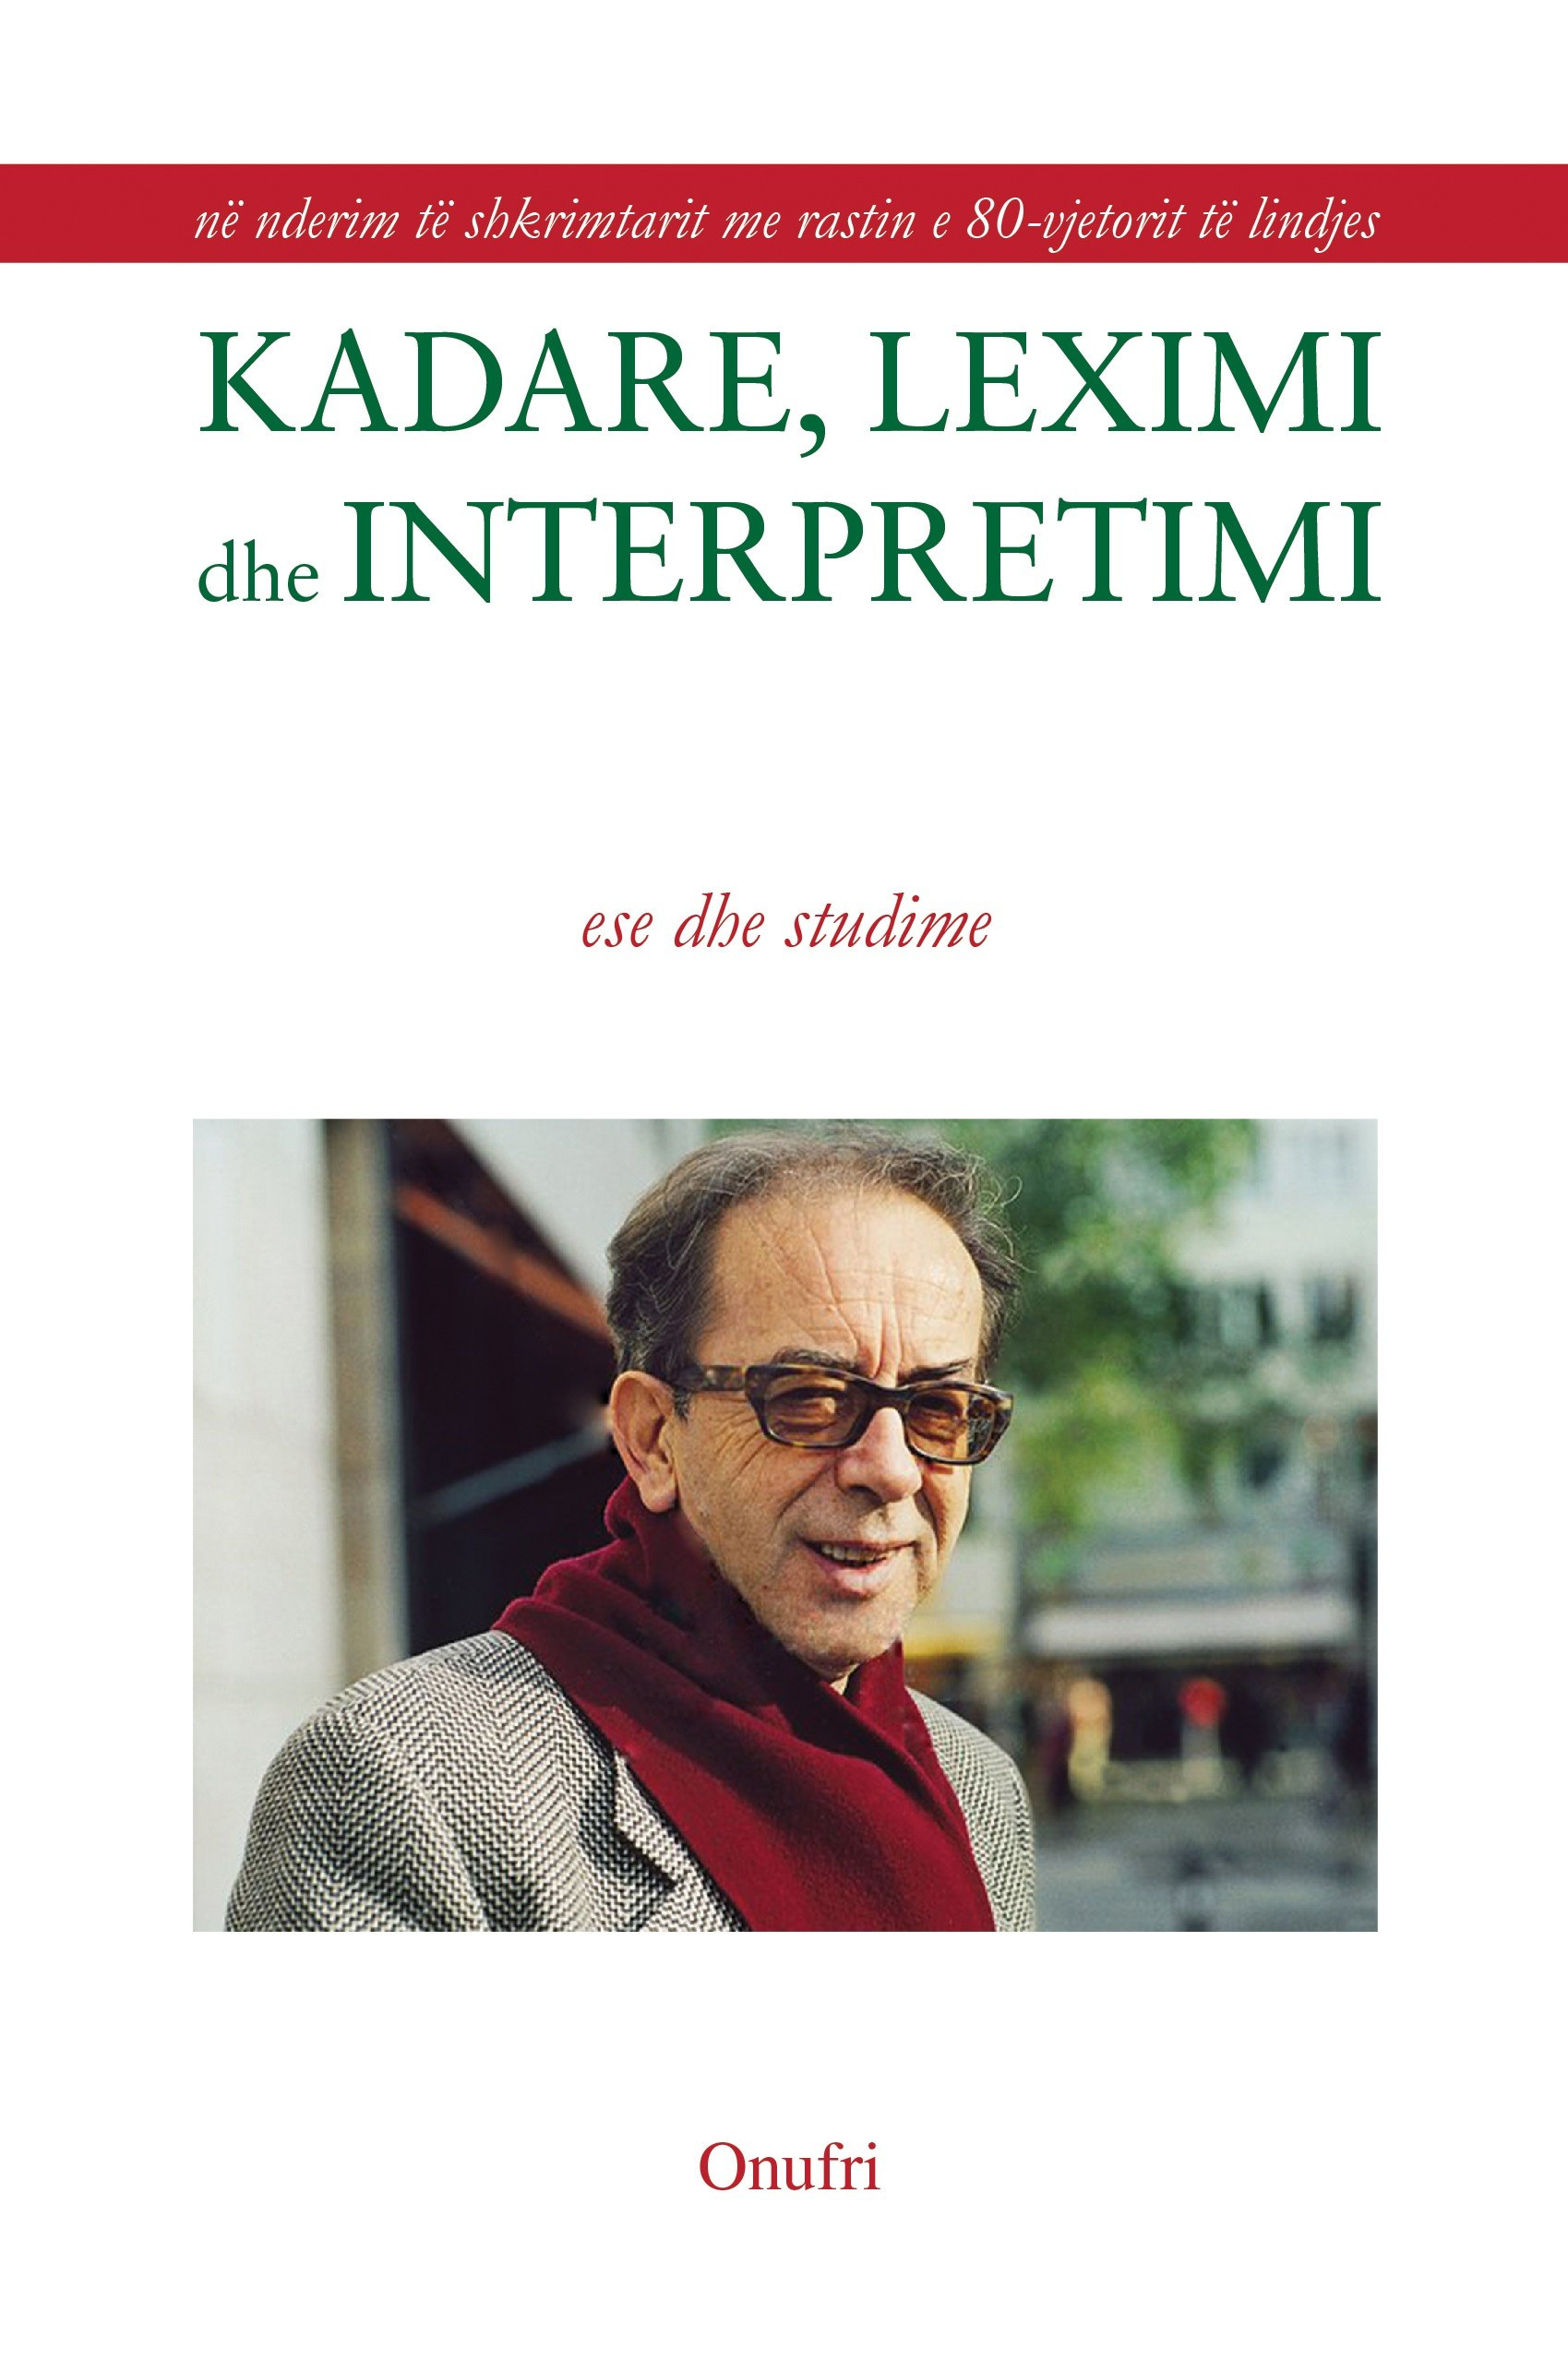 Kadare, leximi dhe interpretimi